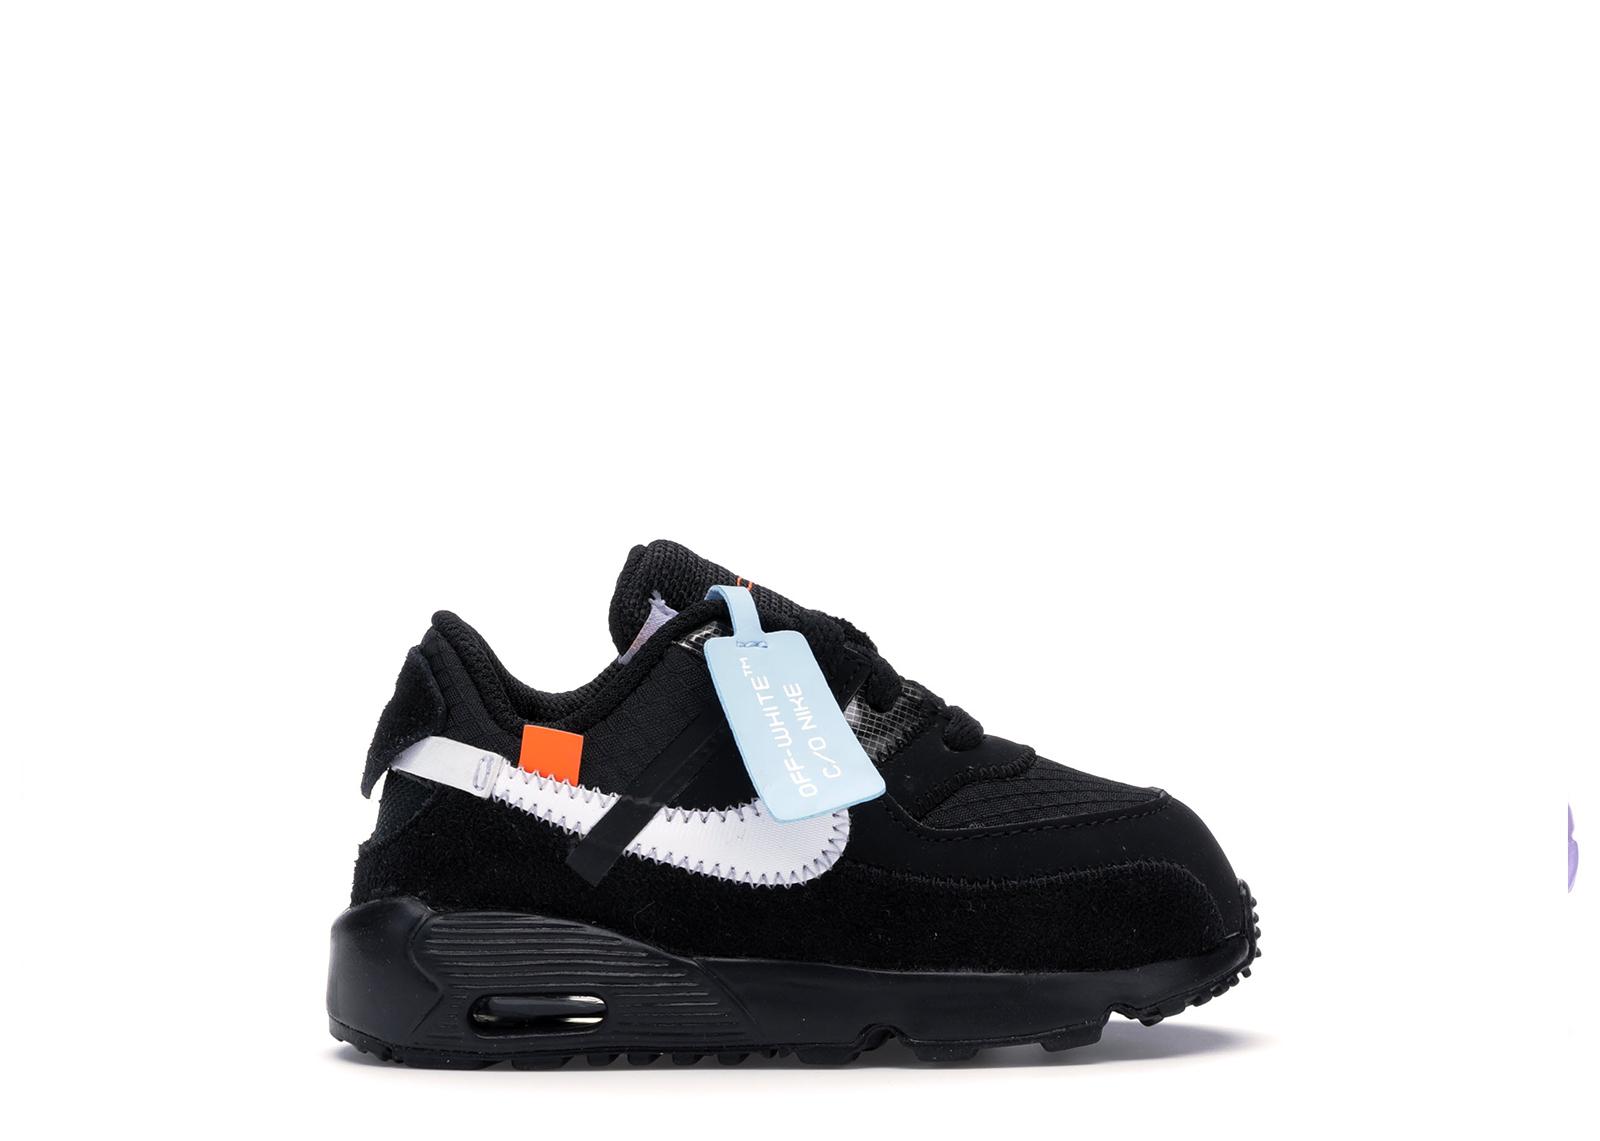 Nike Air Max 90 OFF-WHITE Black White (TD)